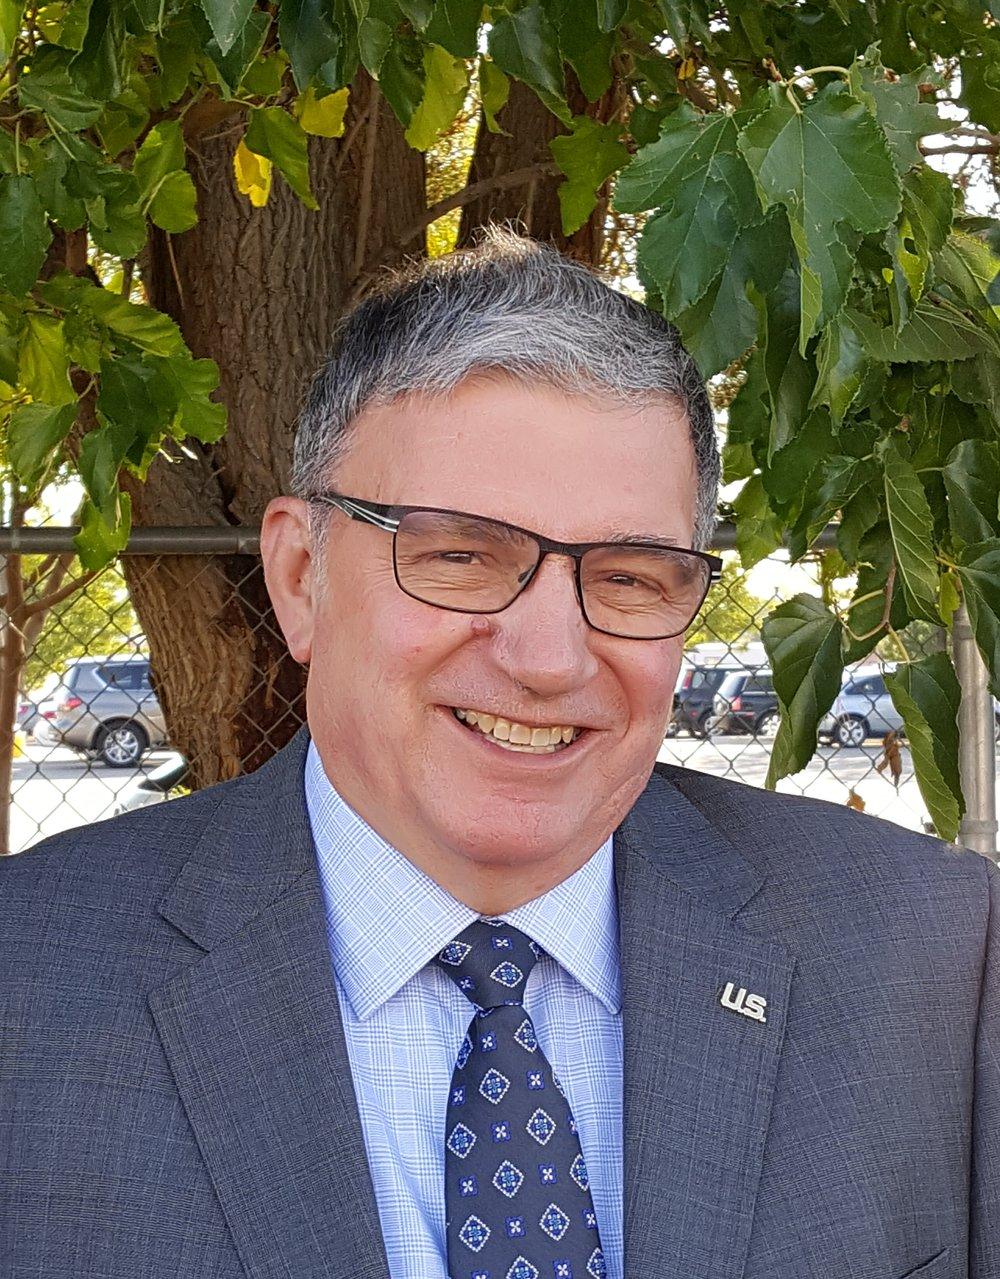 David McClusky II, MD Surgery Faculty Tel: (208) 810-7812 dmcclusky2@idahocom.org